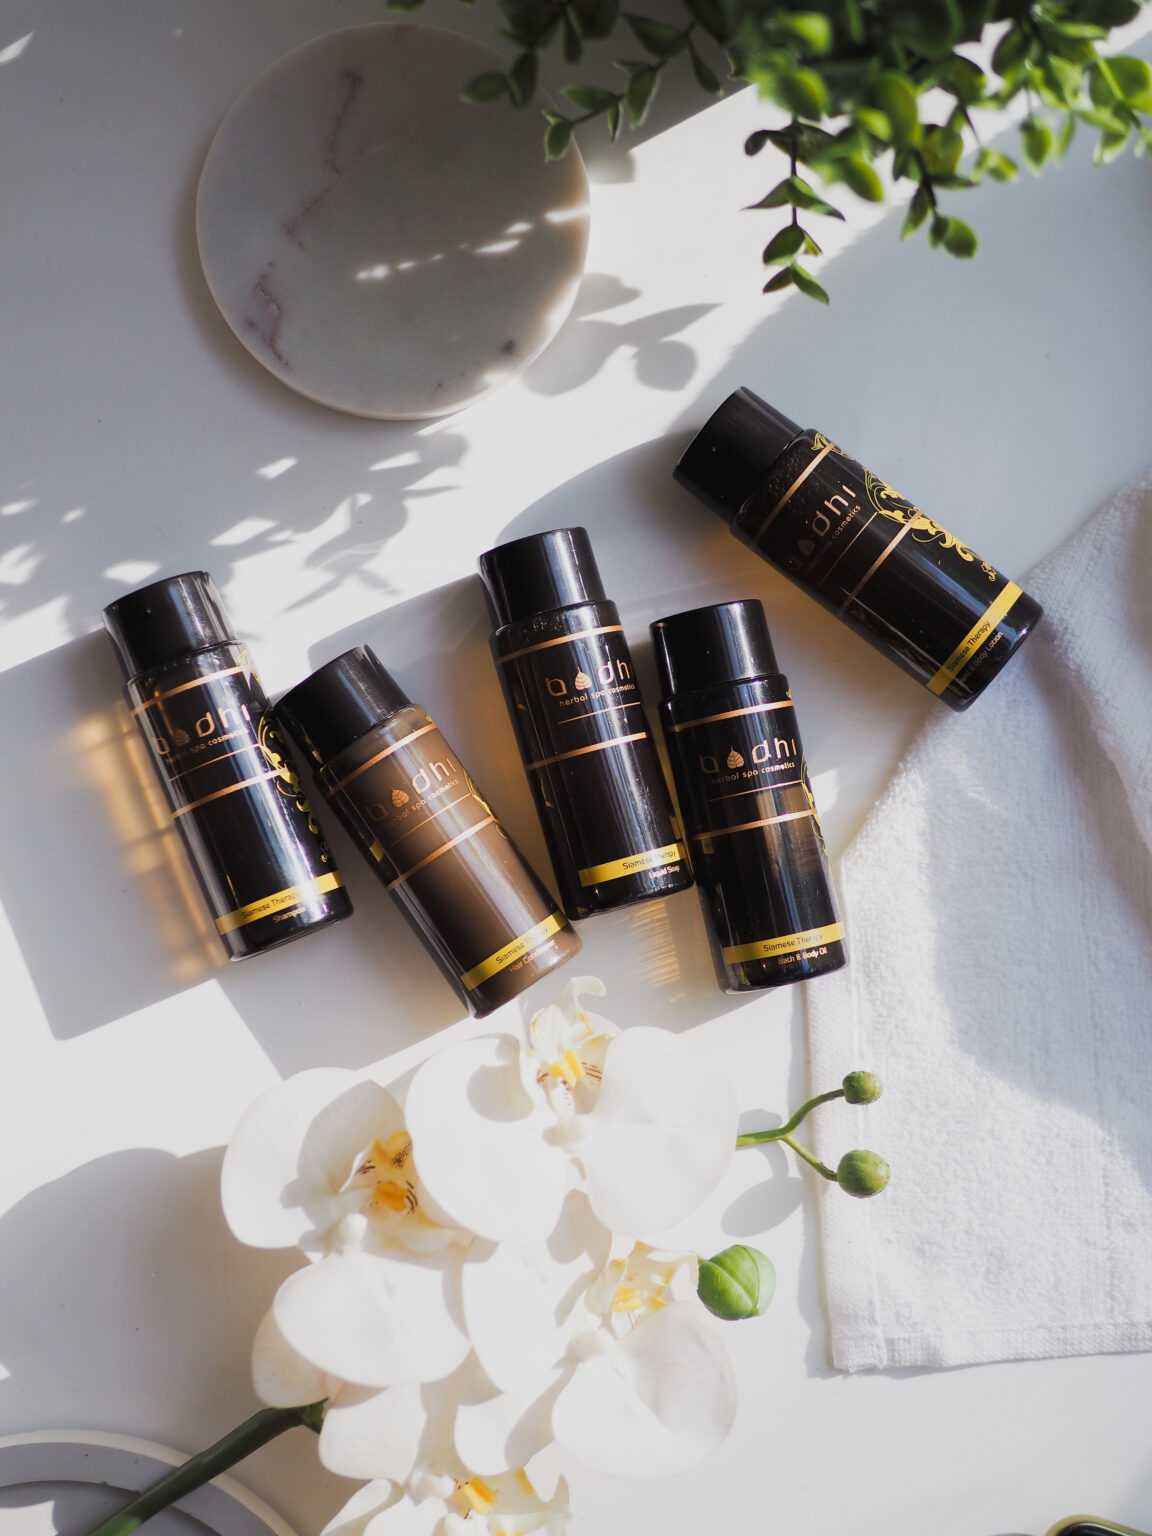 kosmetyki-naturalne-zestaw-podrozny